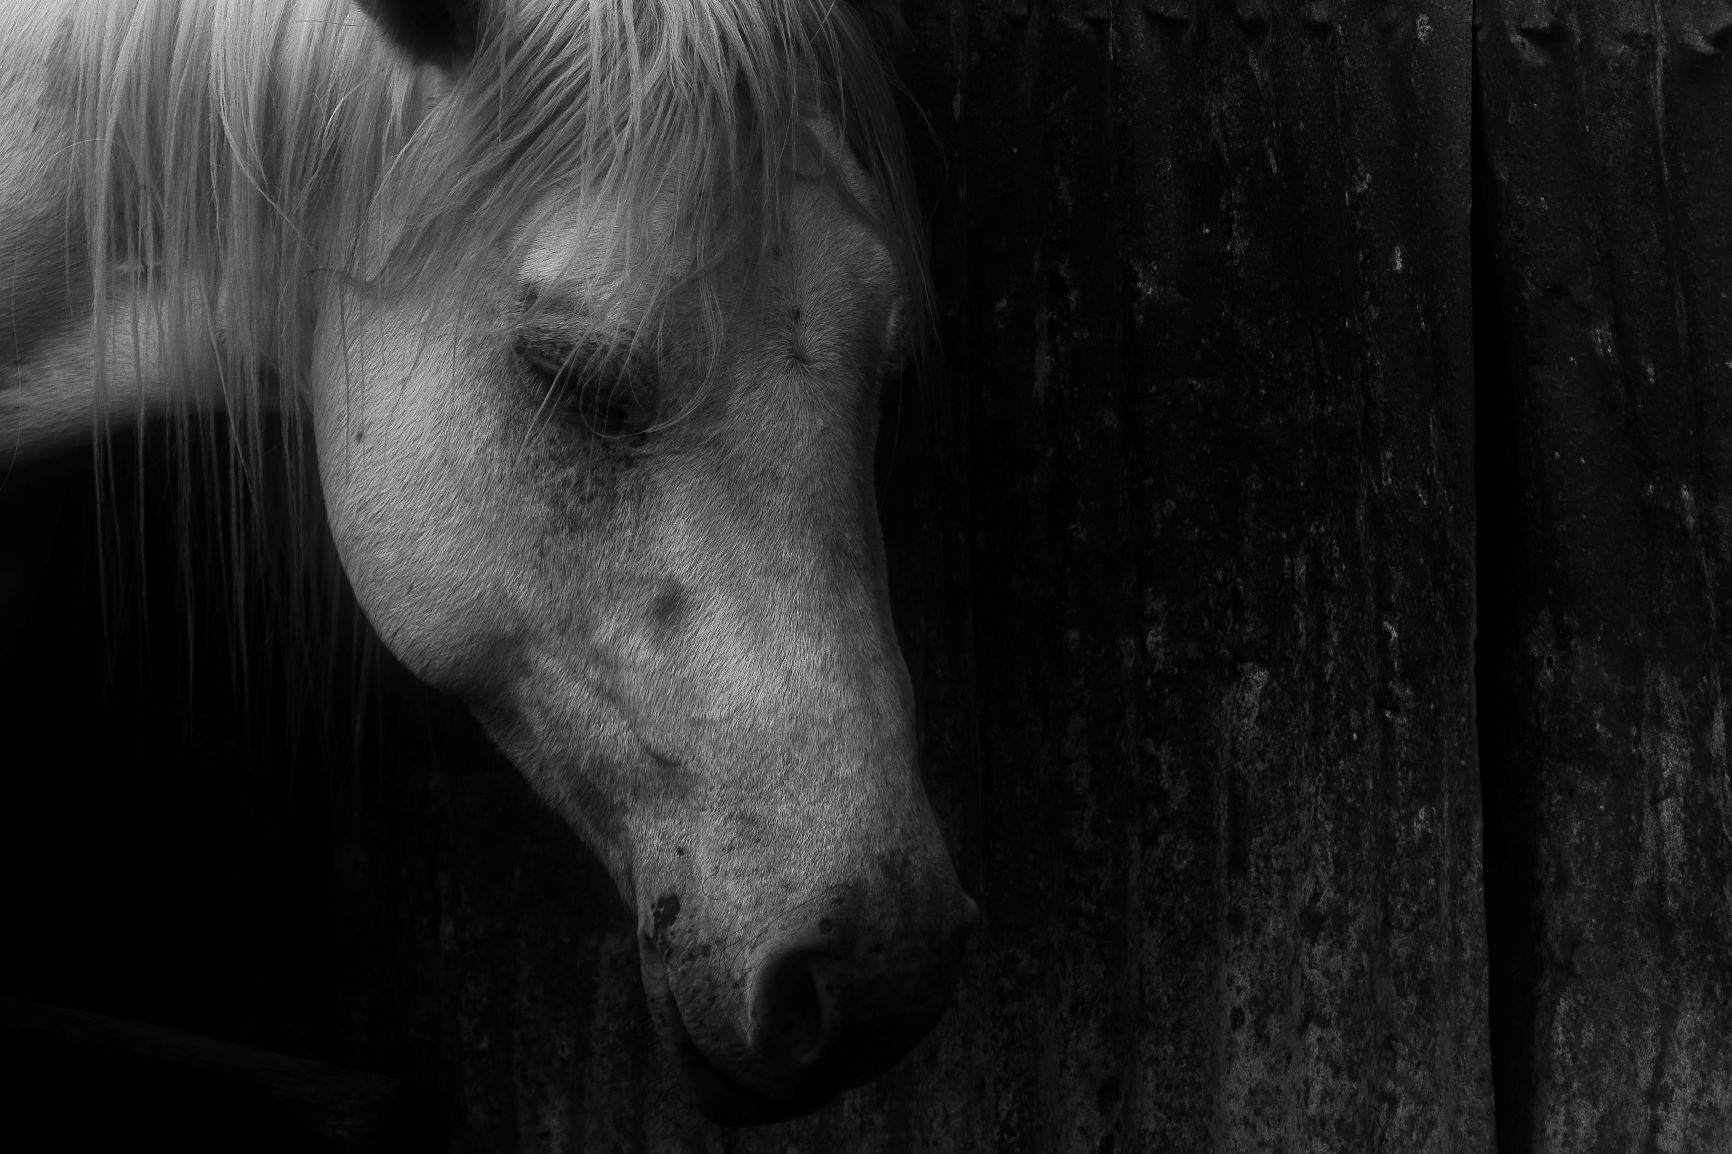 mouse mood horse photo